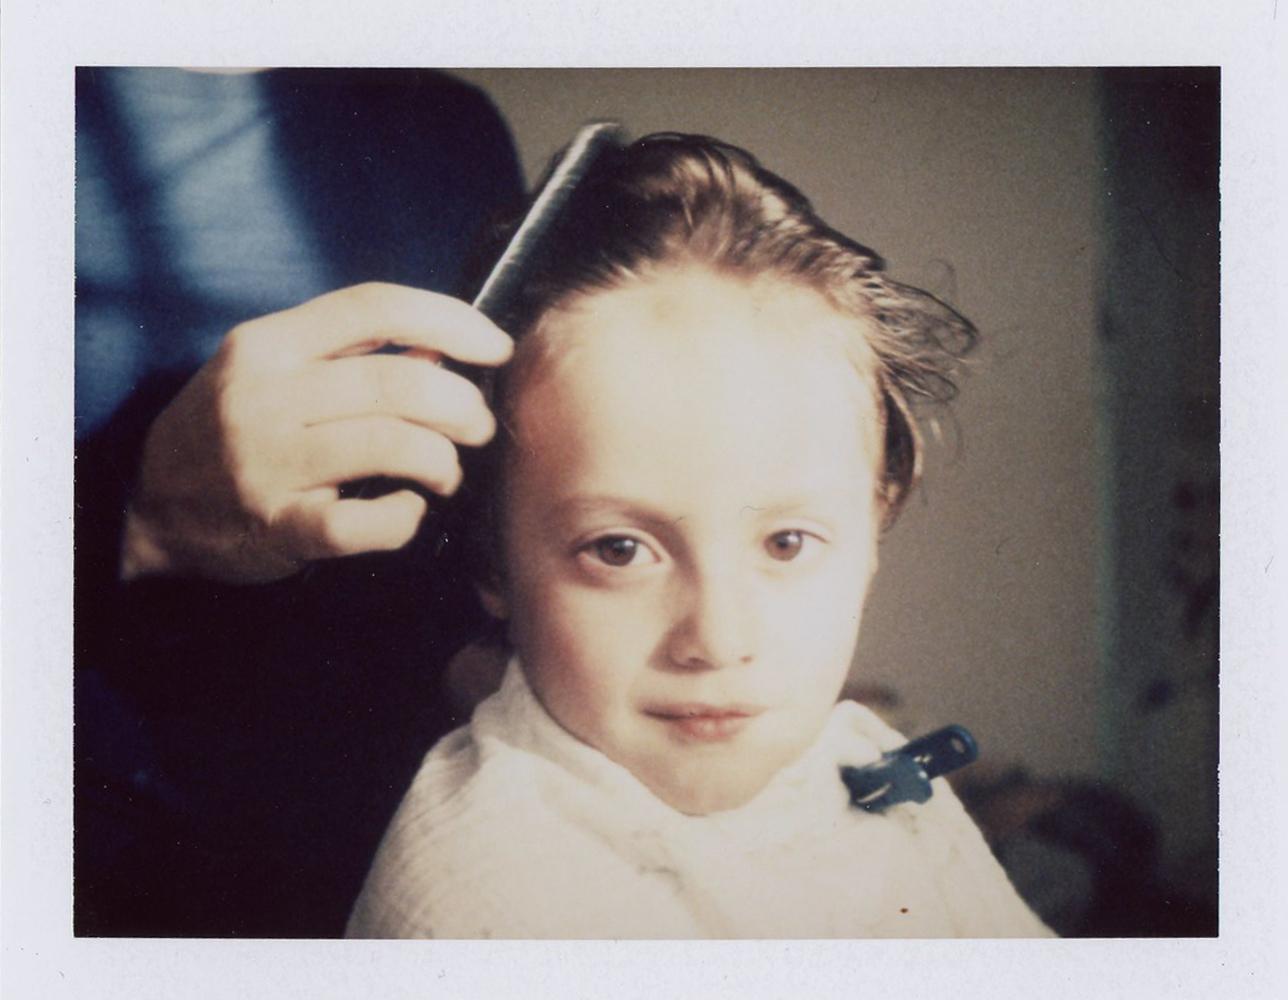 Avery Getting a Haircut, 2017